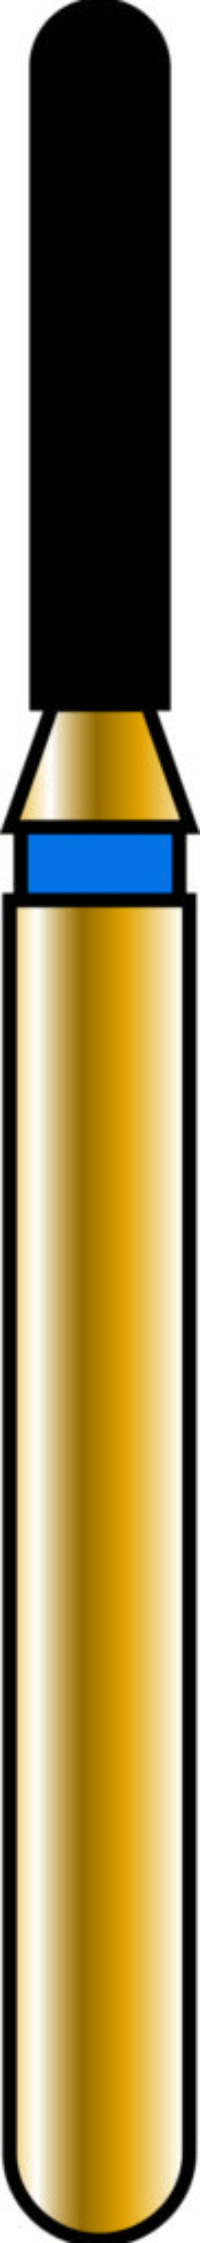 Round End Cylinder 12-6mm Gold Diamond Bur - Coarse Grit